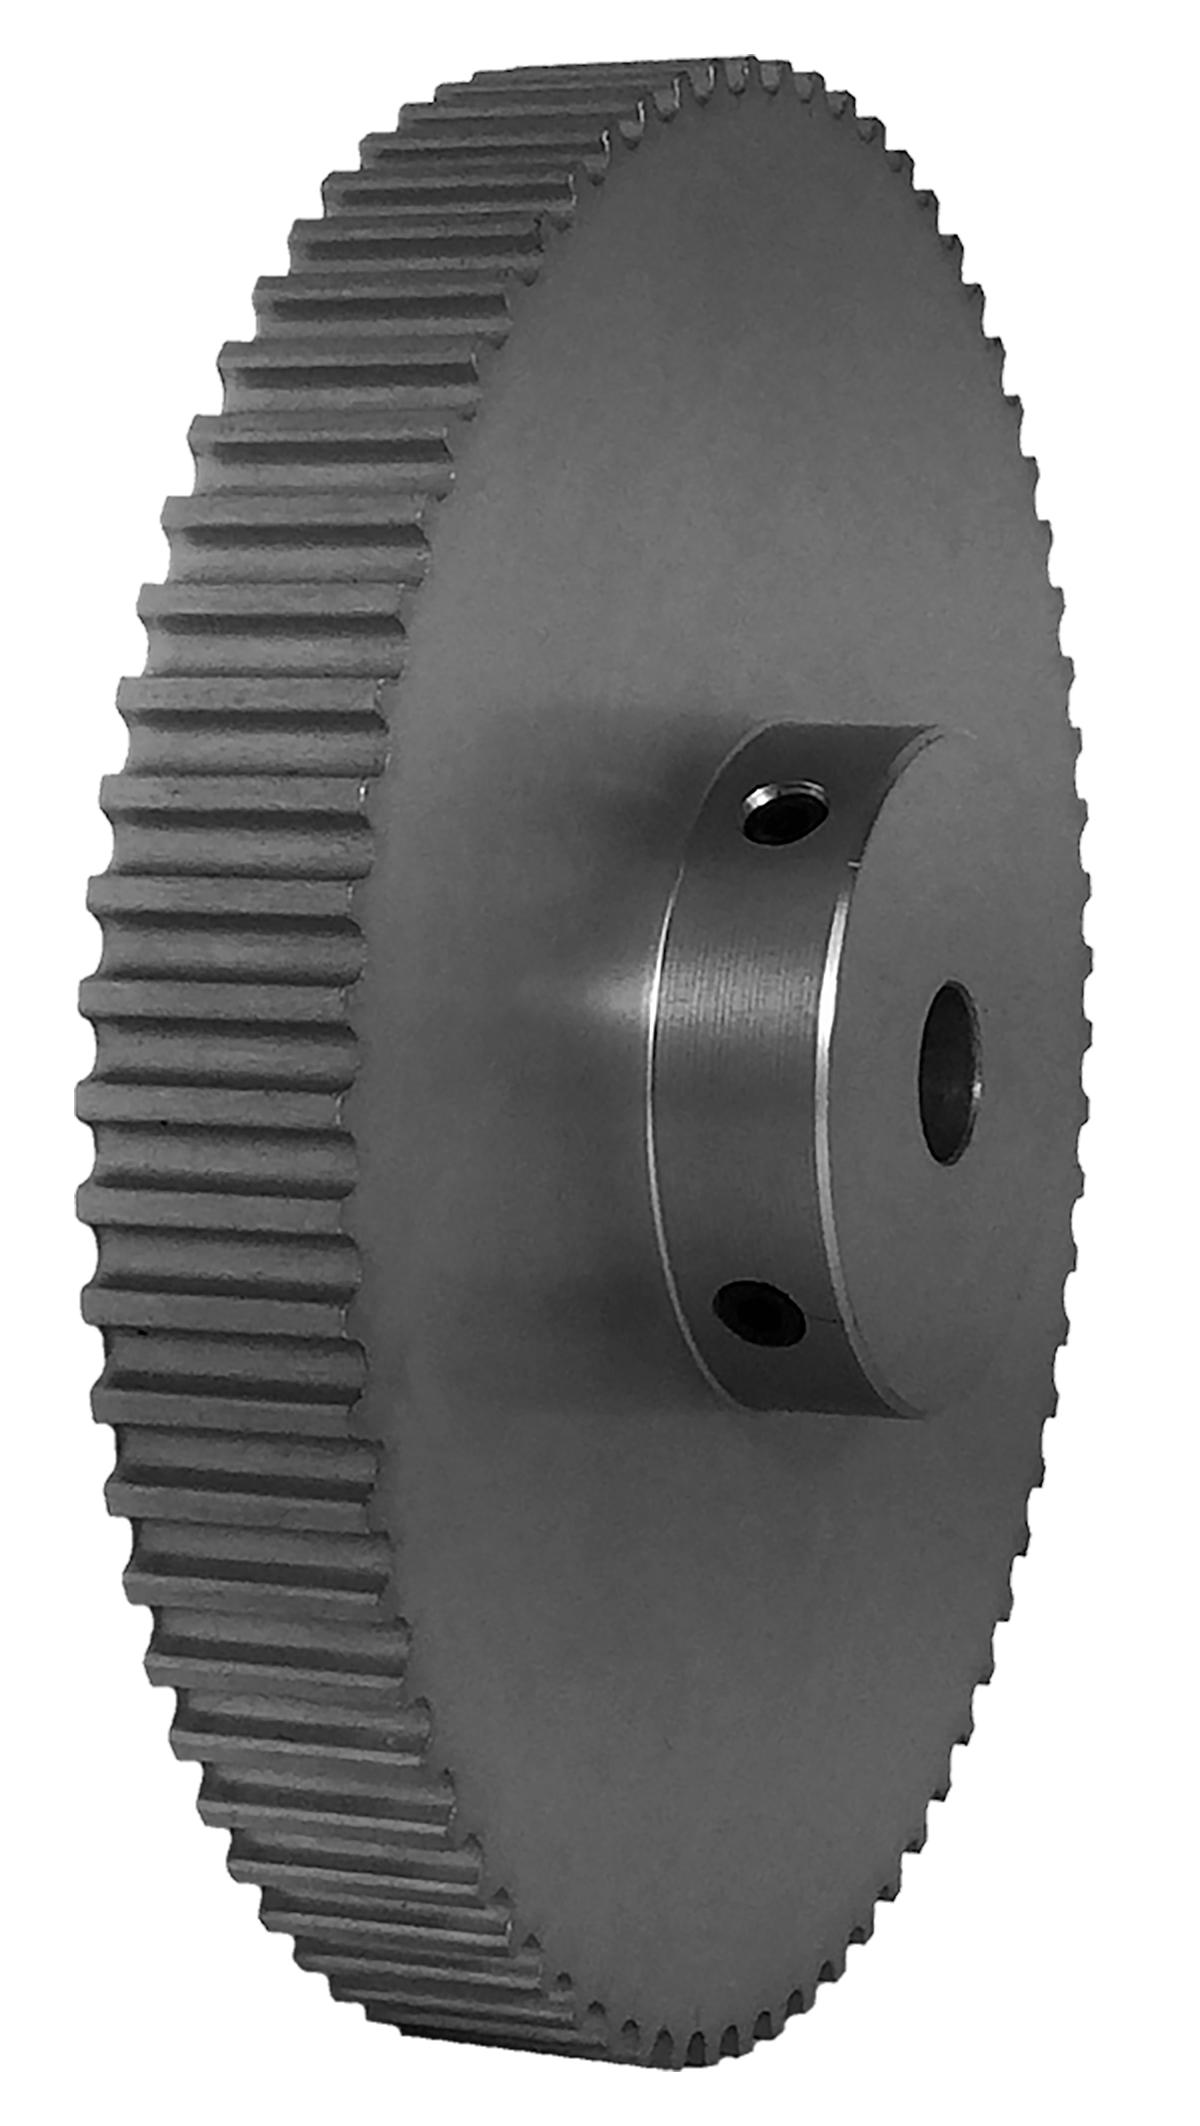 70-5M09-6A5 - Aluminum Powerhouse®HTD® Pulleys